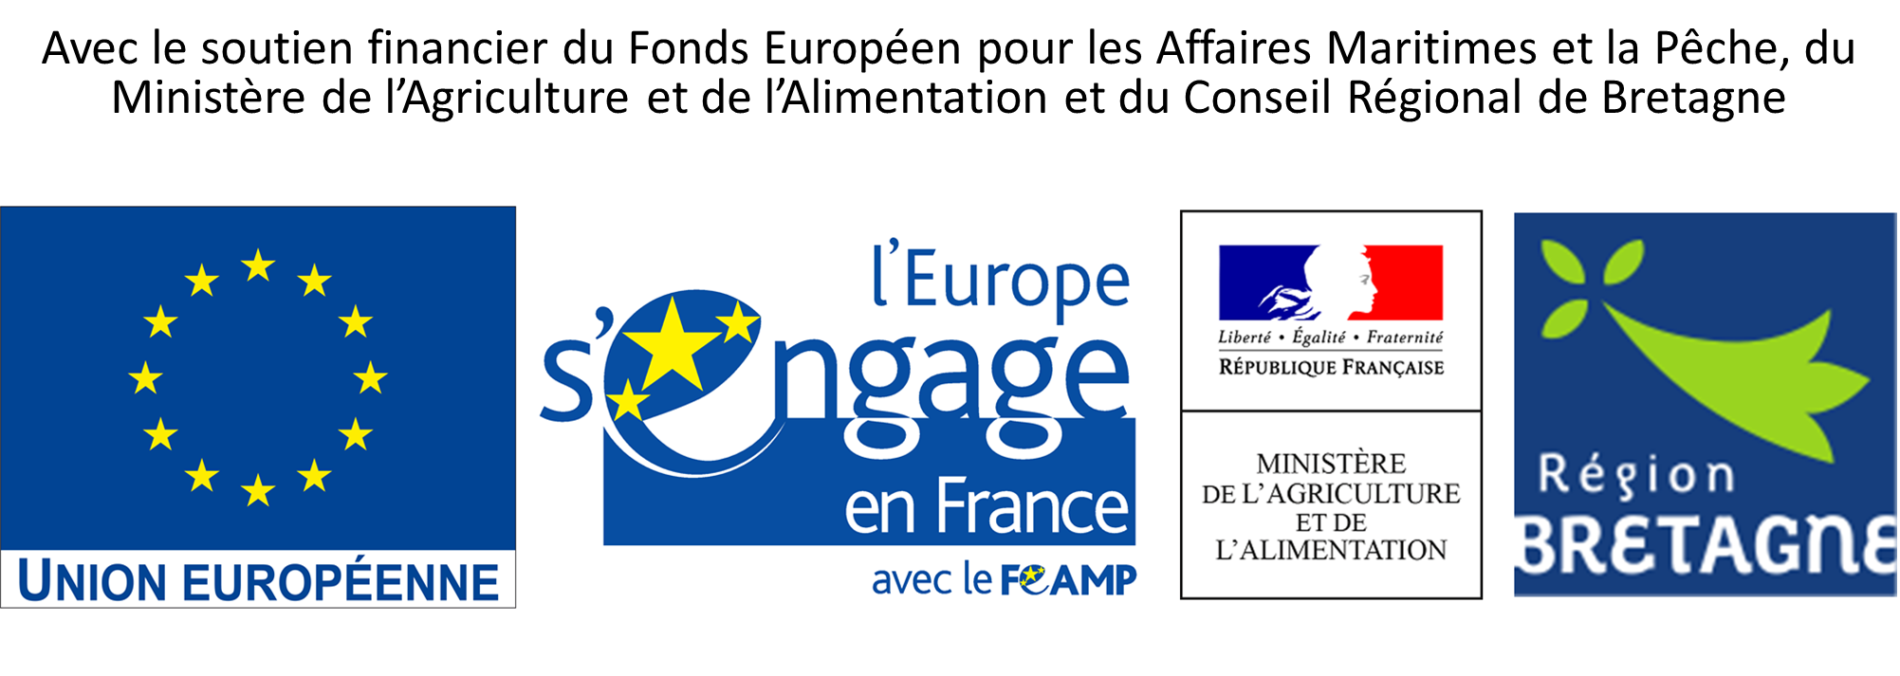 Logos financeurs région bretagne europe